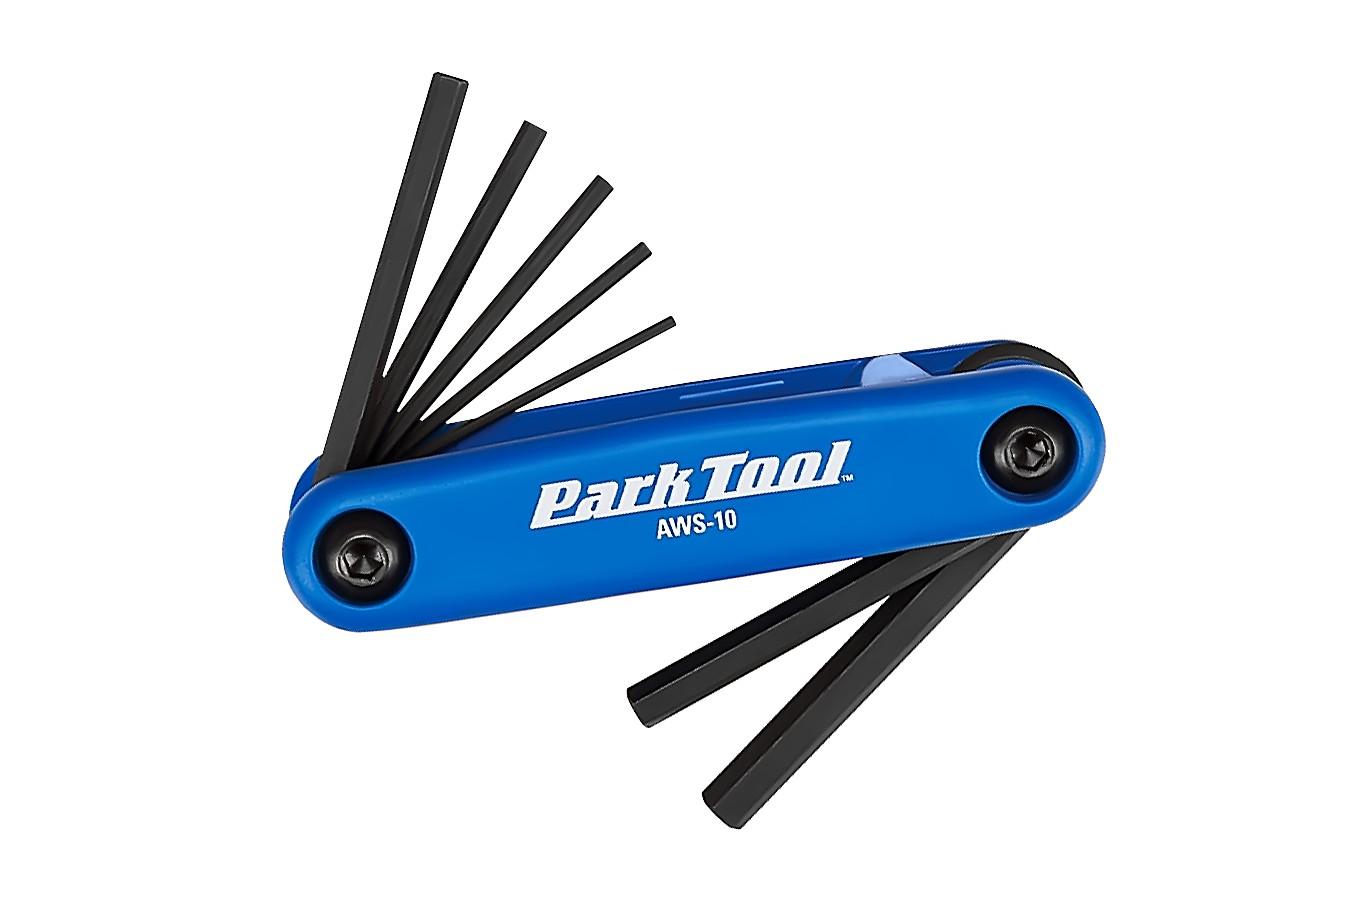 Kit Ferramentas Bike Canivete 7 Funções AWS-10 - Partktool